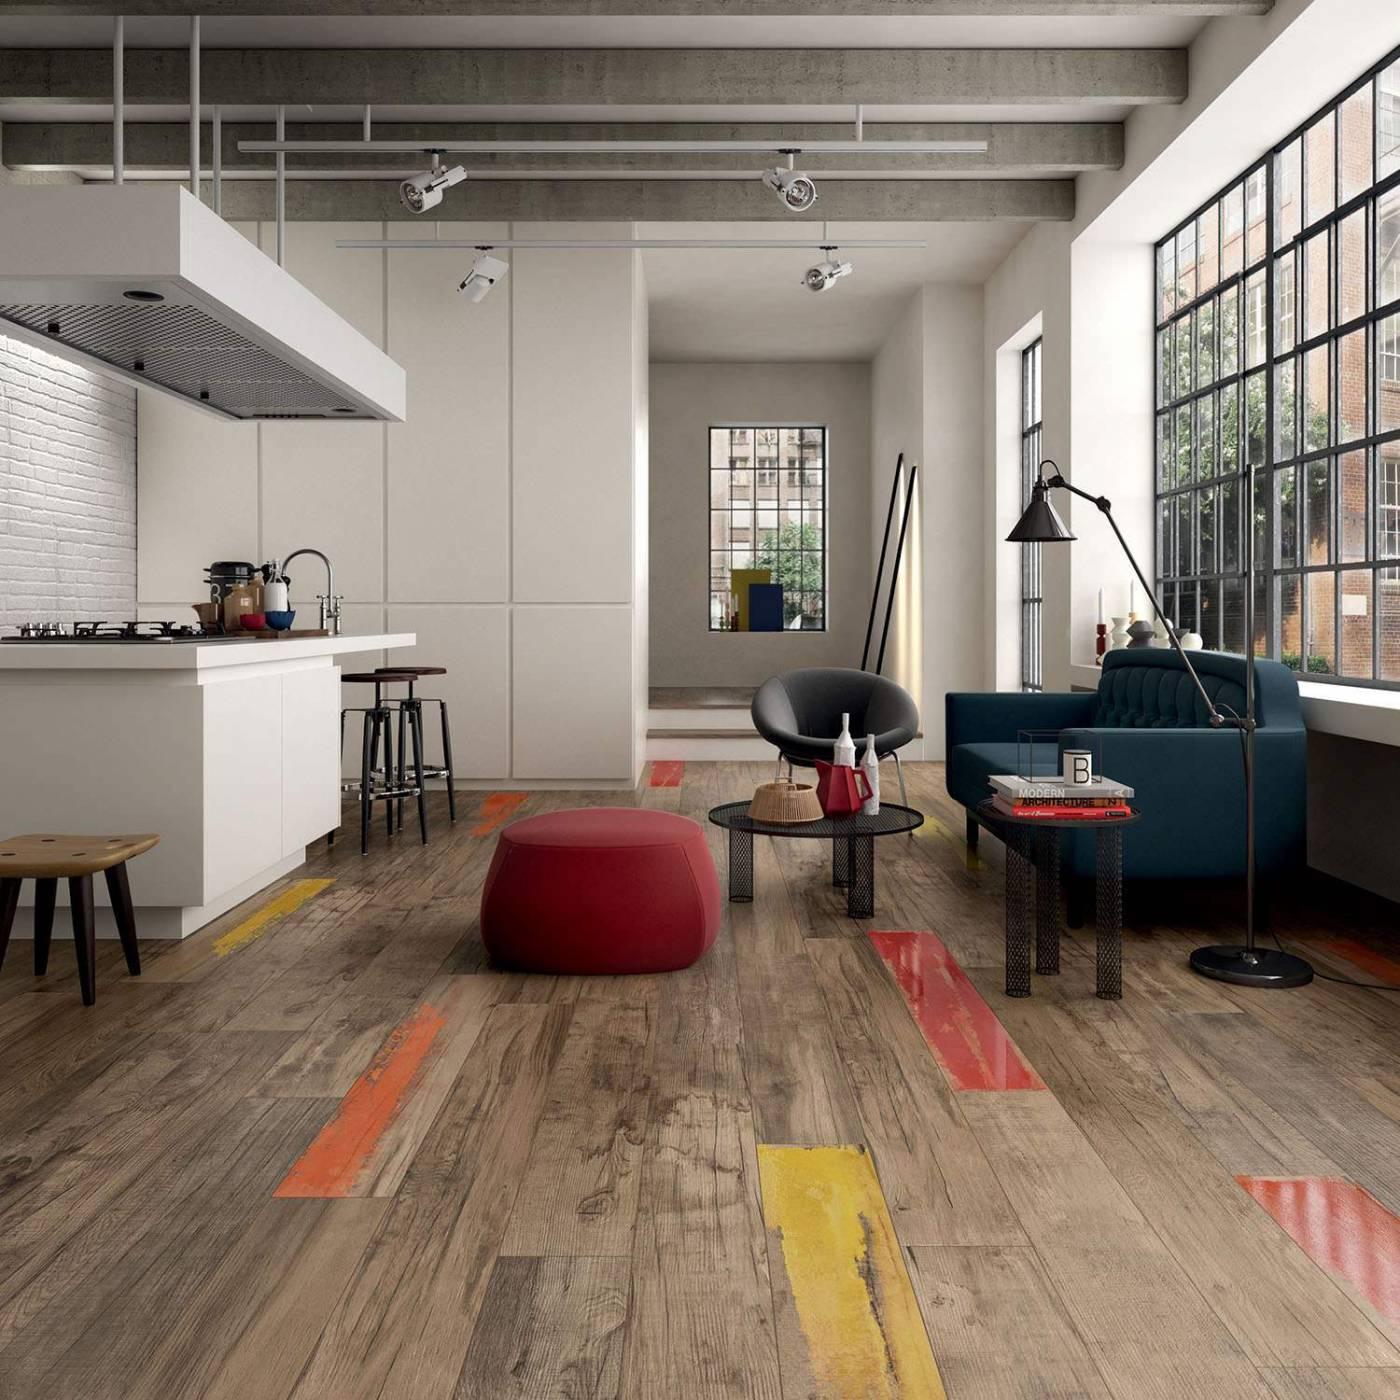 carrelage int rieur imitation bois aix en provence carrelage int rieur et ext rieur eguilles. Black Bedroom Furniture Sets. Home Design Ideas